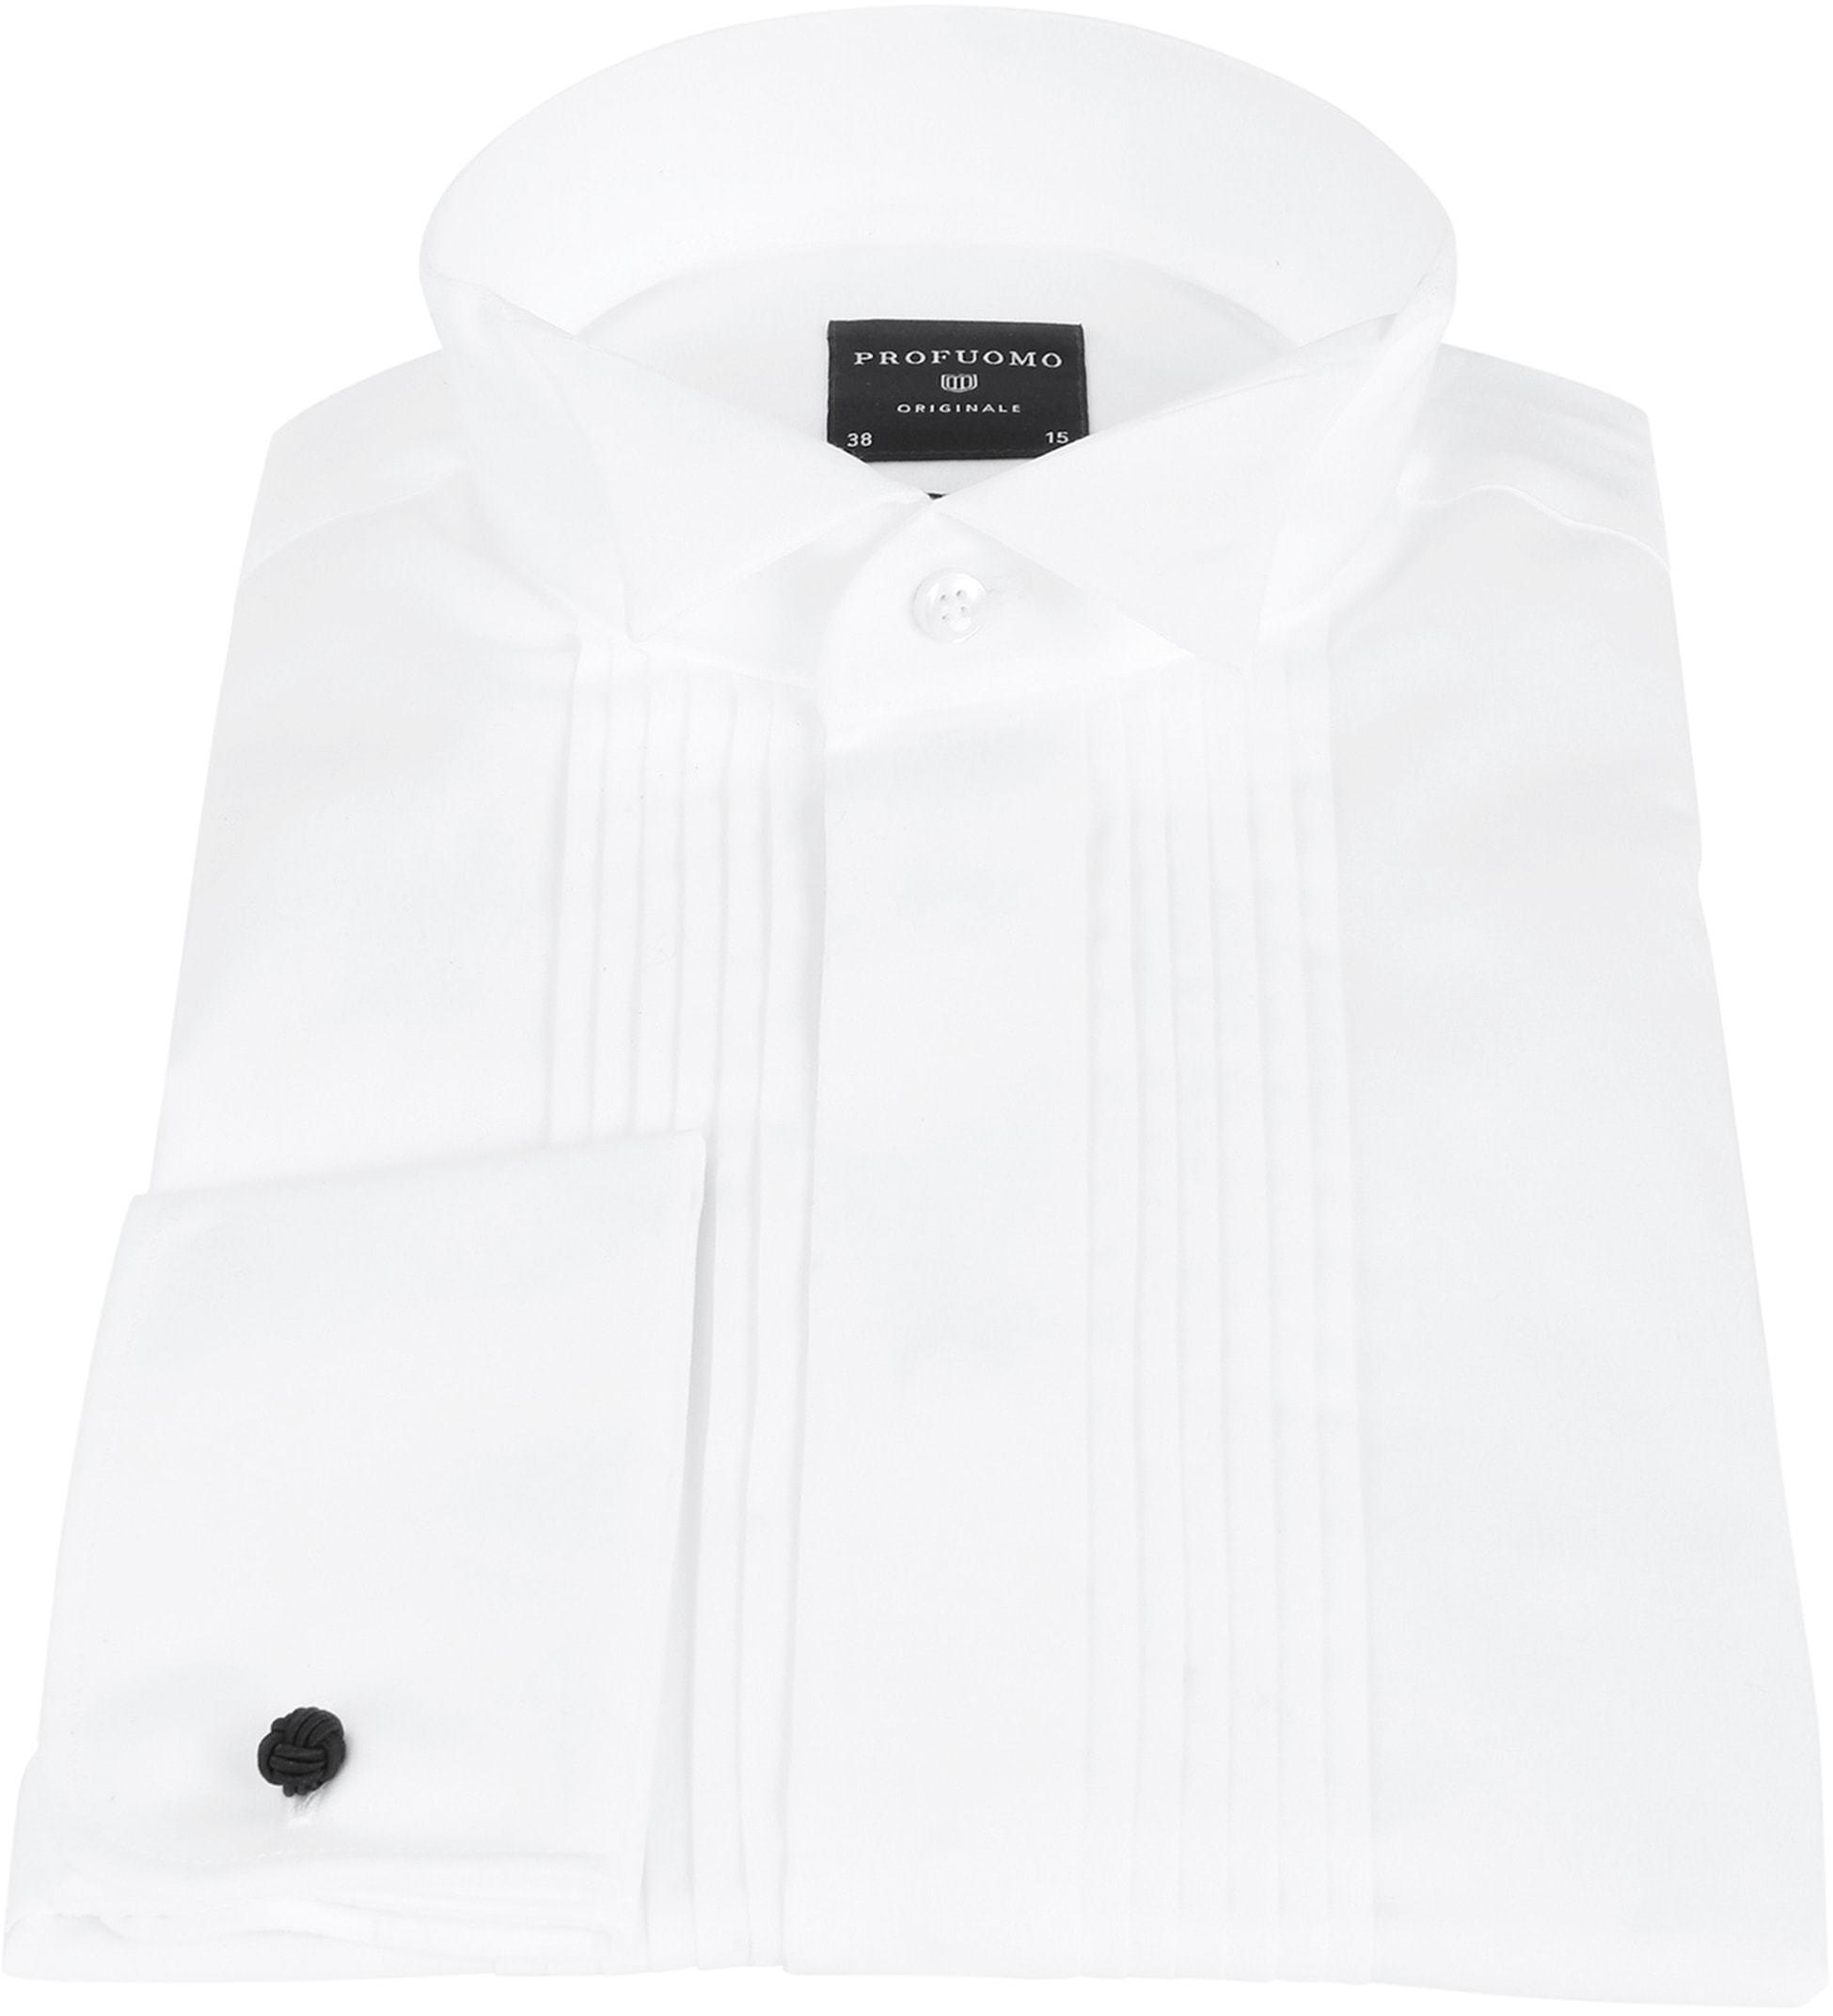 Profuomo Smoking Hemd Plissiert Slim Fit Weiß foto 2